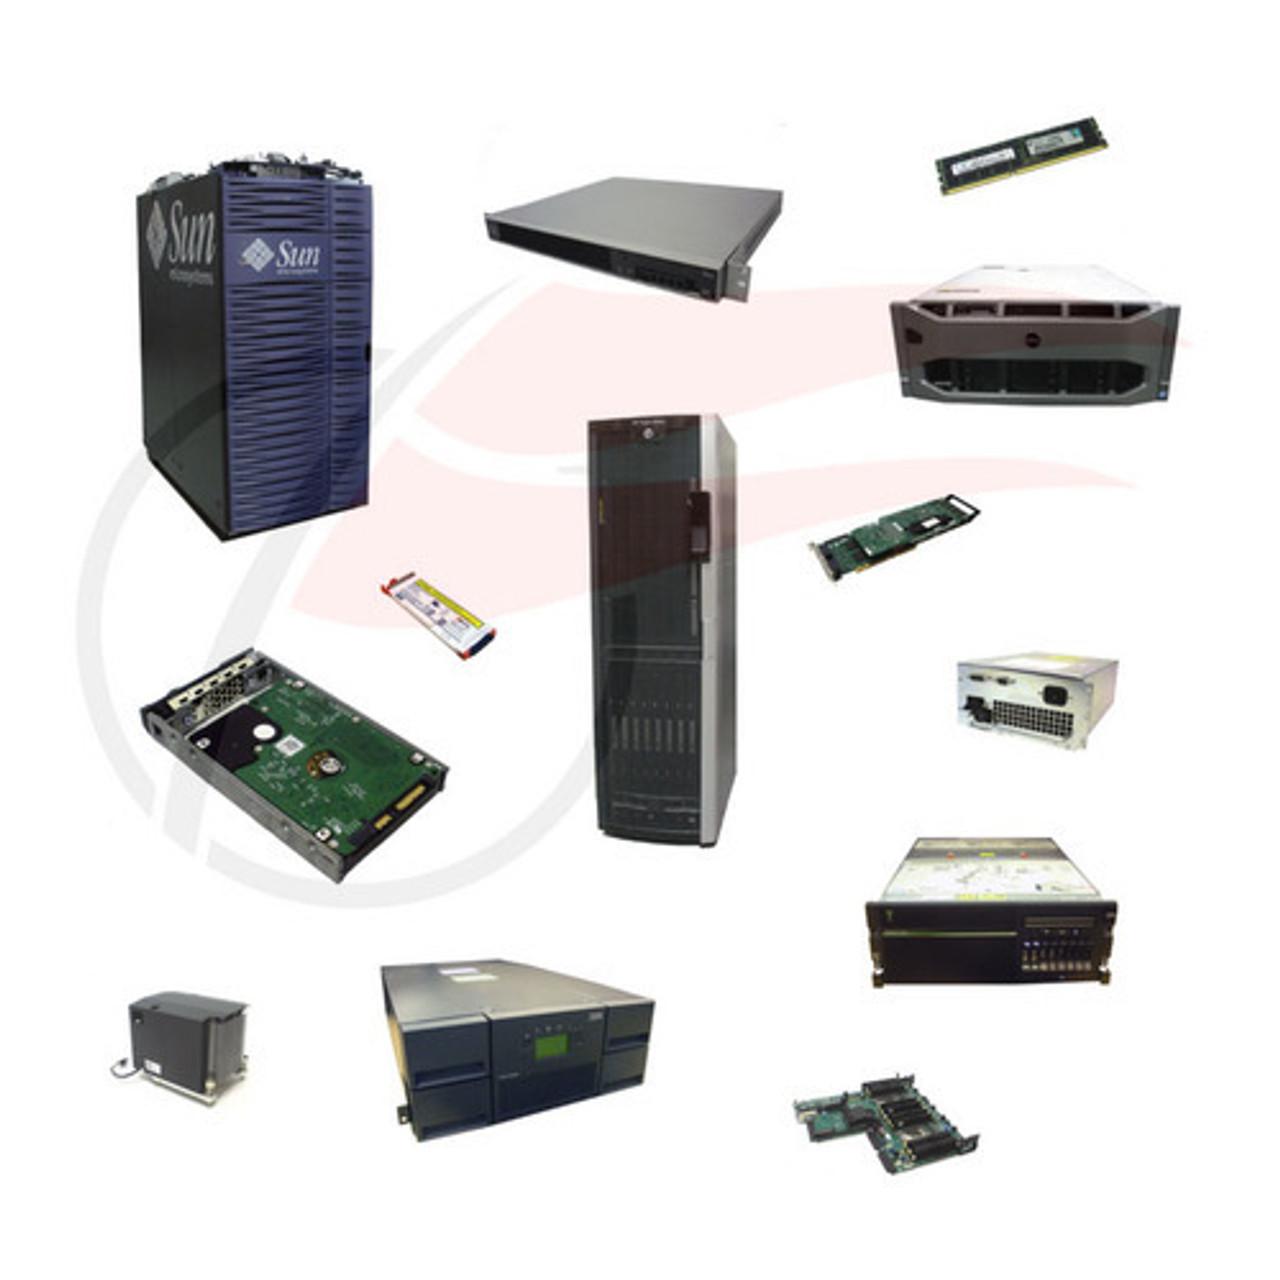 IBM BladeCenter Servers